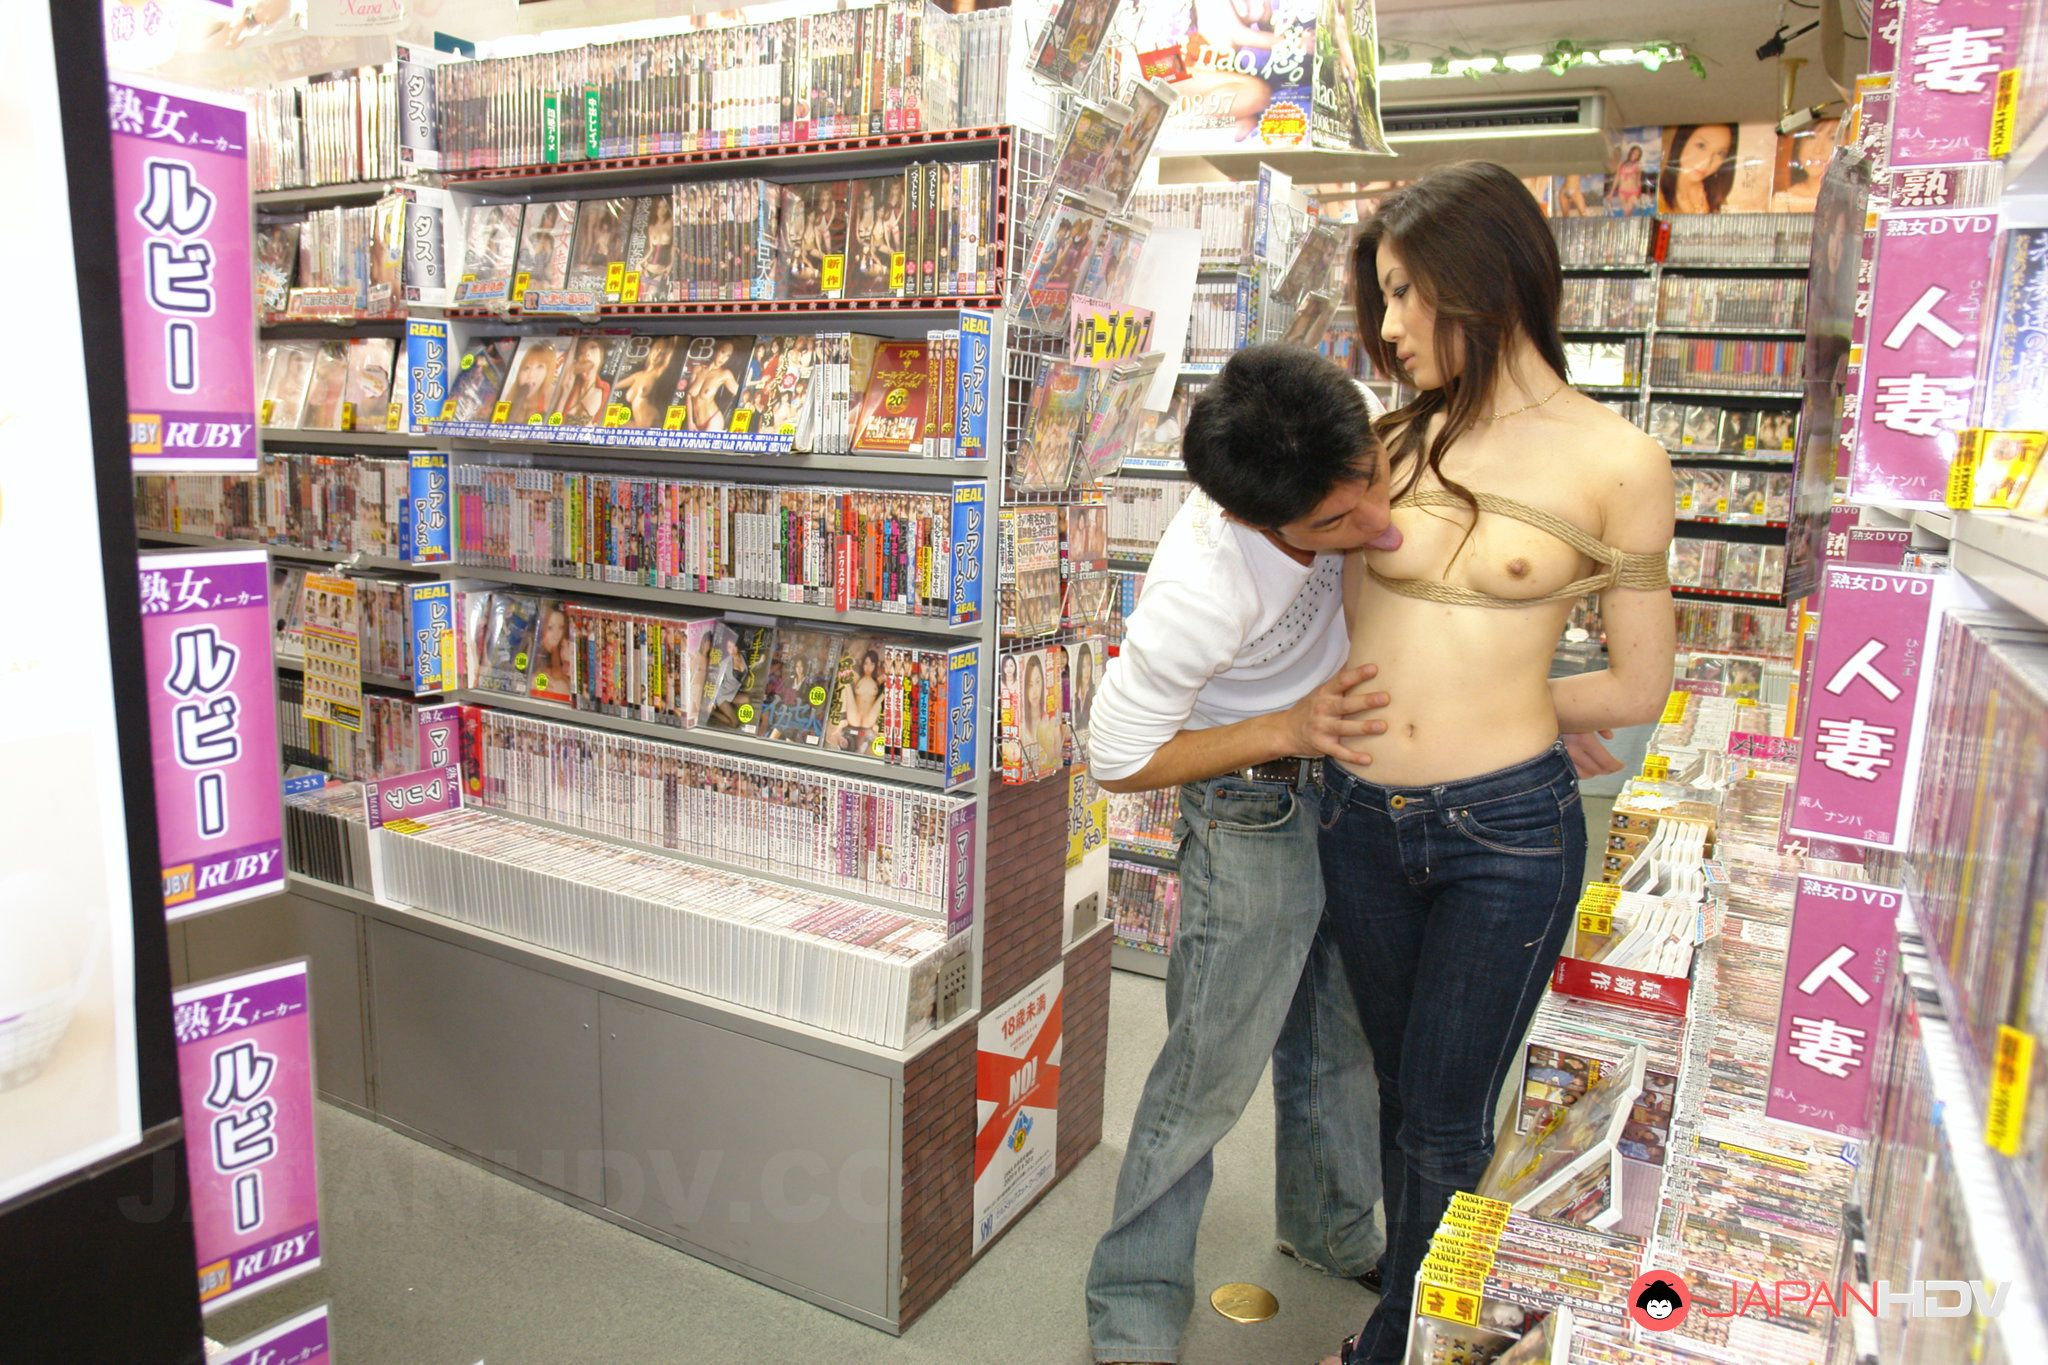 Japanese group bondage sex nude pics